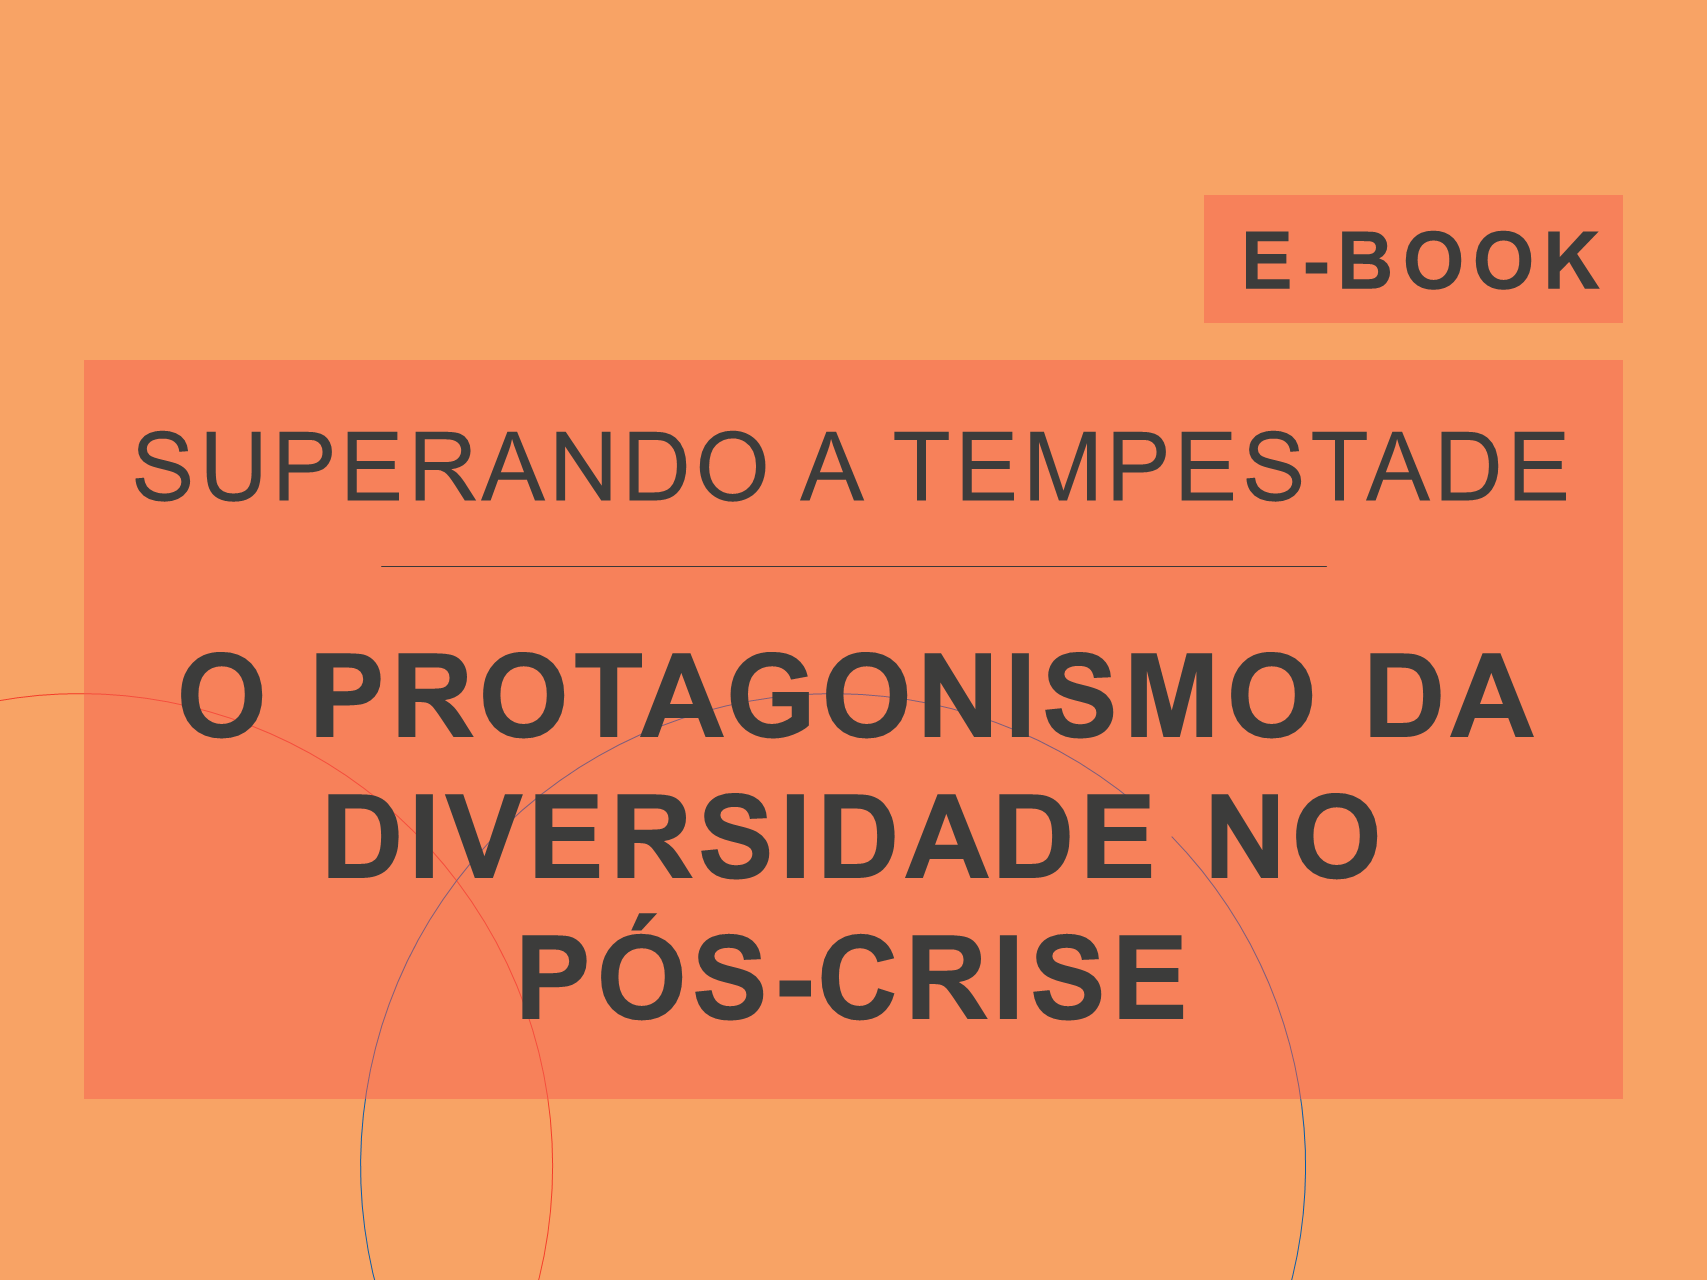 Capa do e-Book da série 'Superando a Tempestade', da Cosin Consulting, sobre 'O Protagonismo da Diversidade no Pós-Crise'.